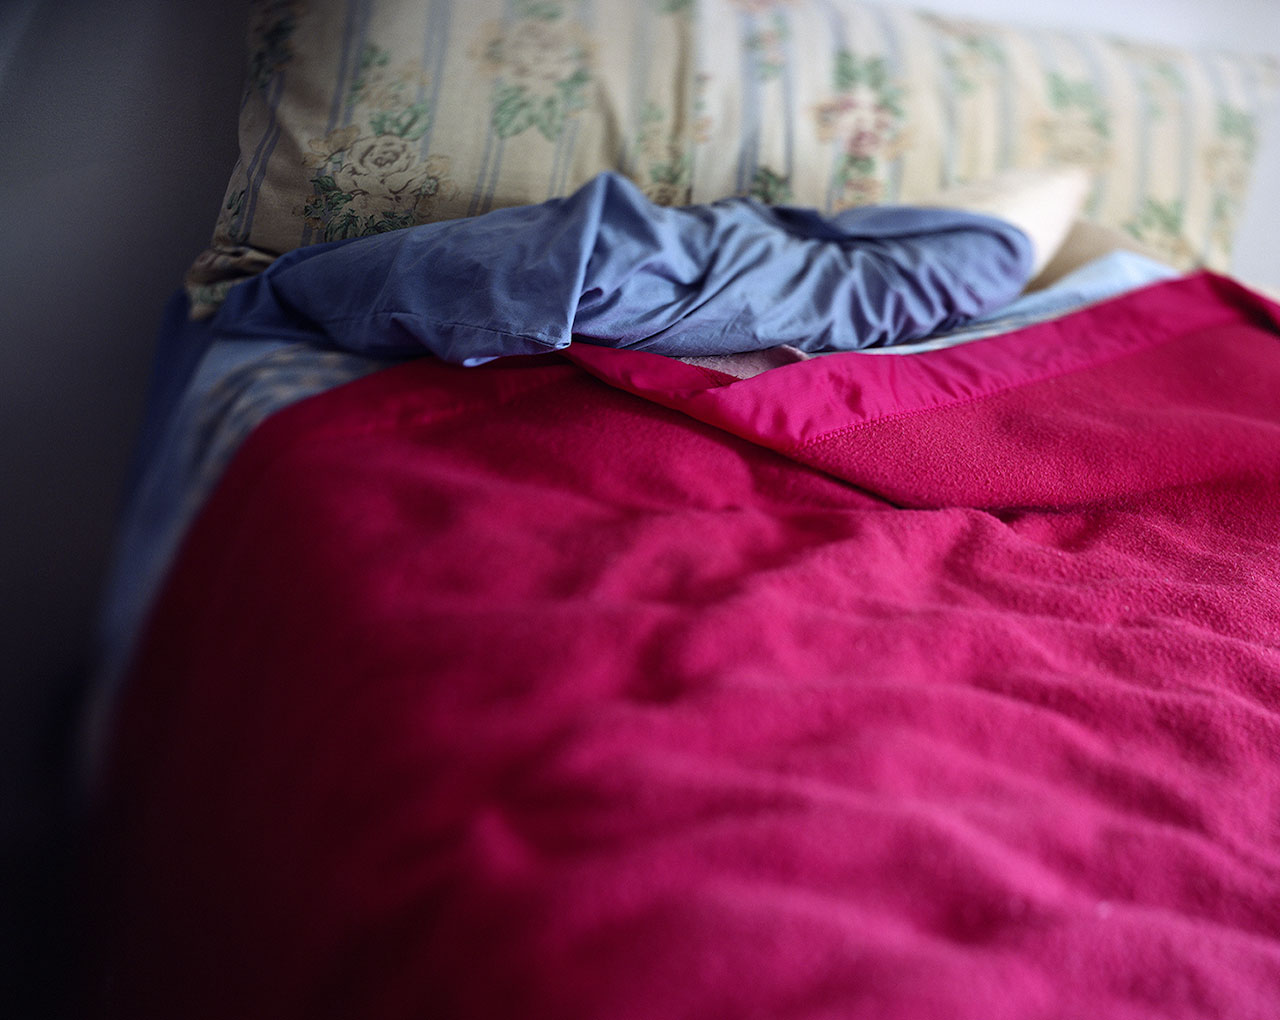 Sooner's Pink Blanket